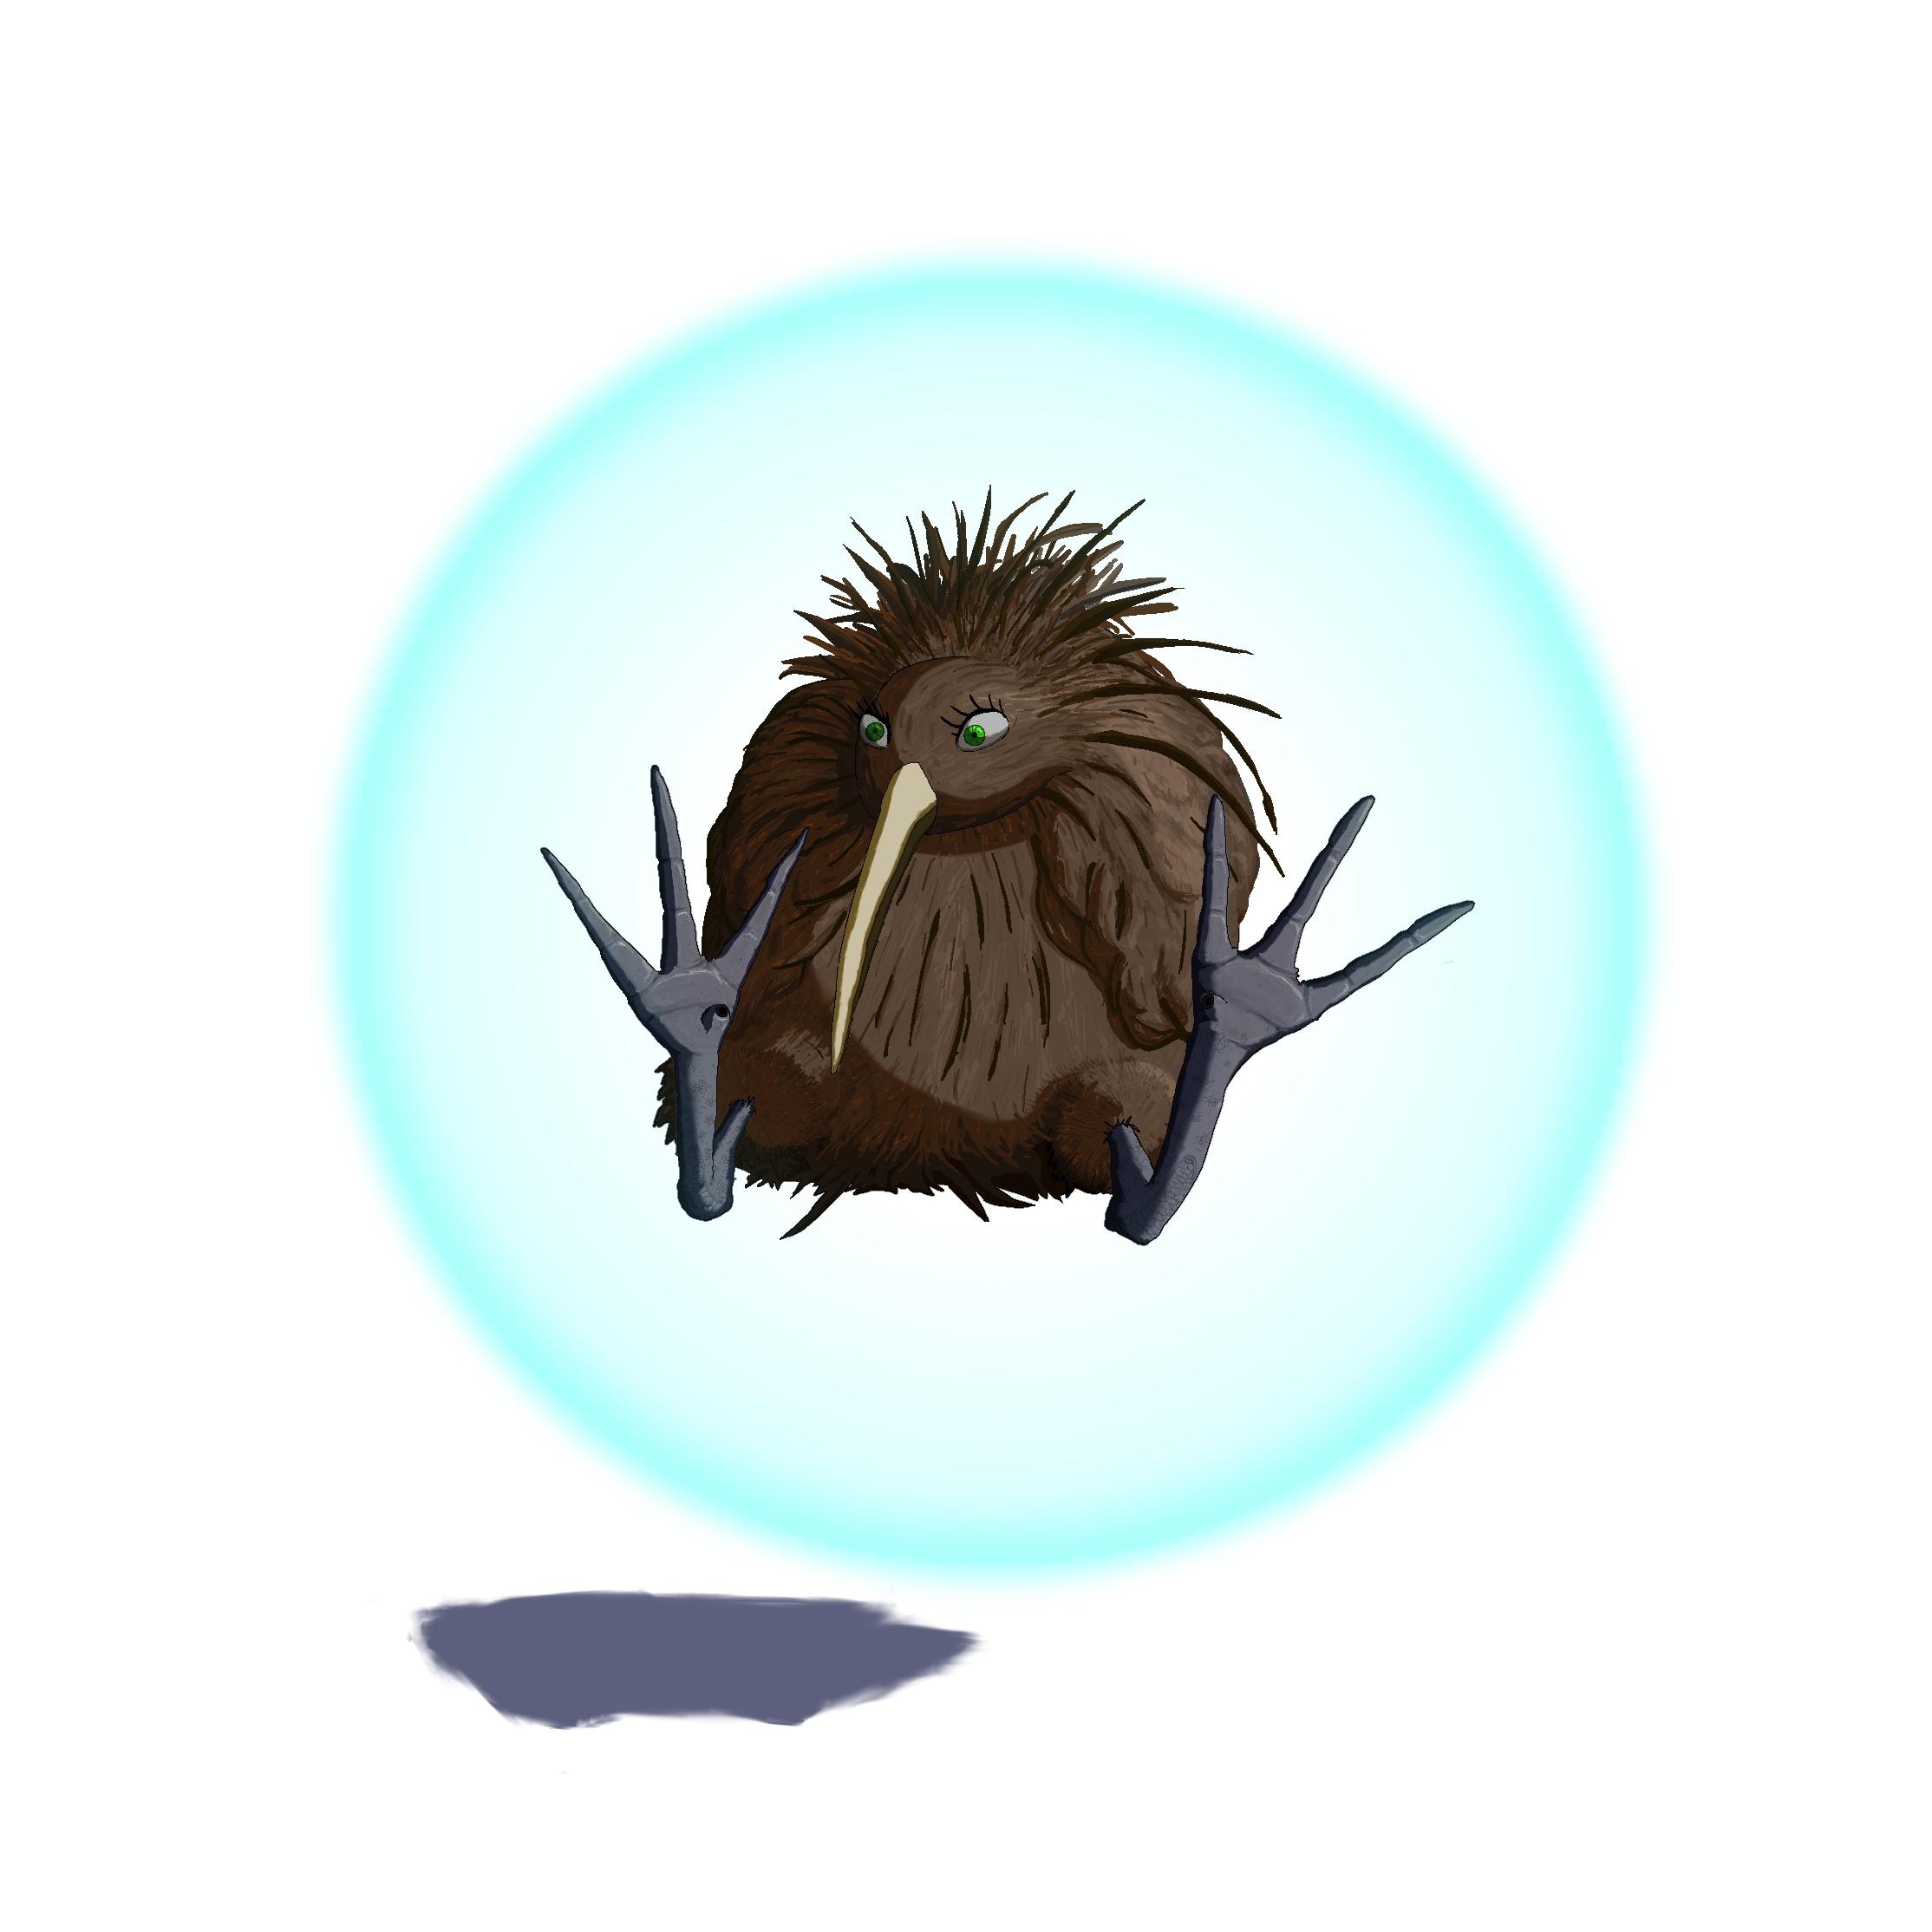 Kiwi in the Sphere